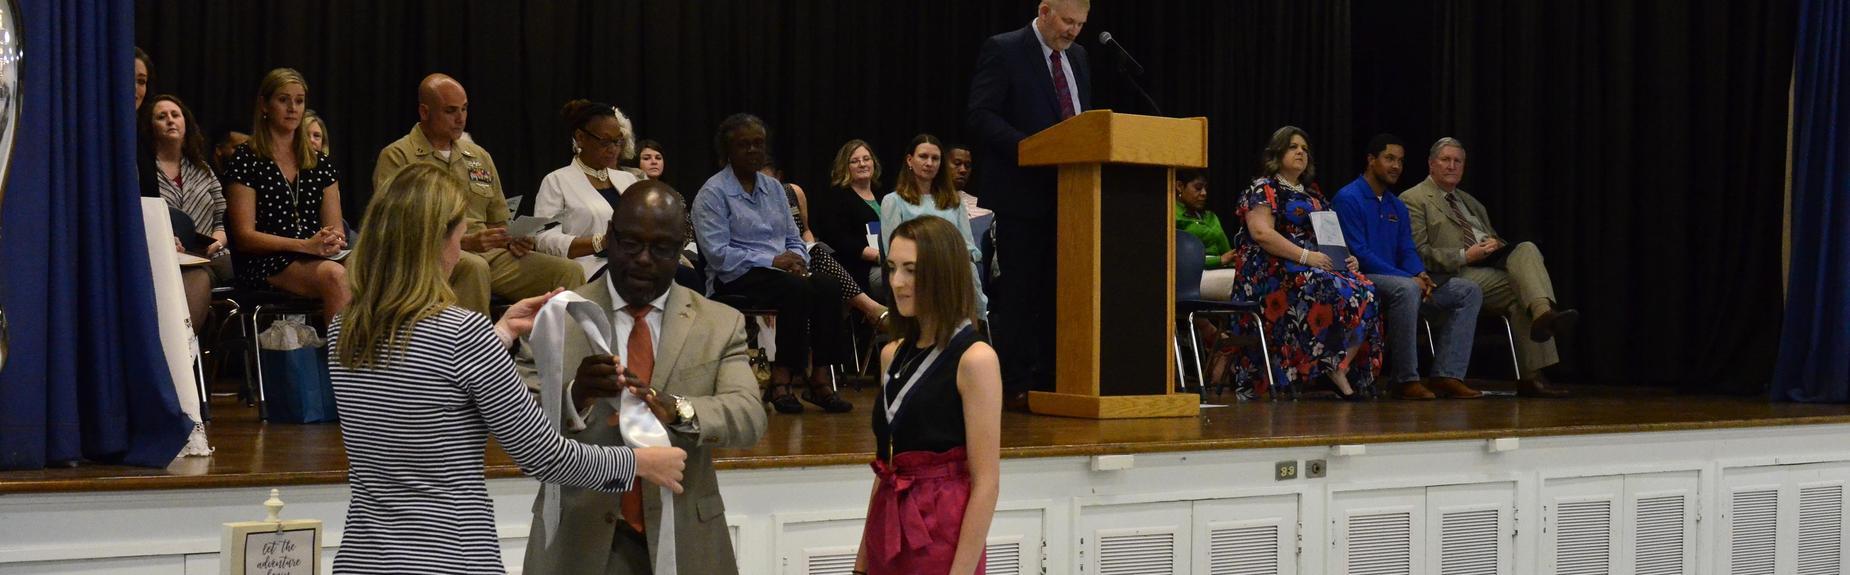 Senior Awards Night Abigail Stephens